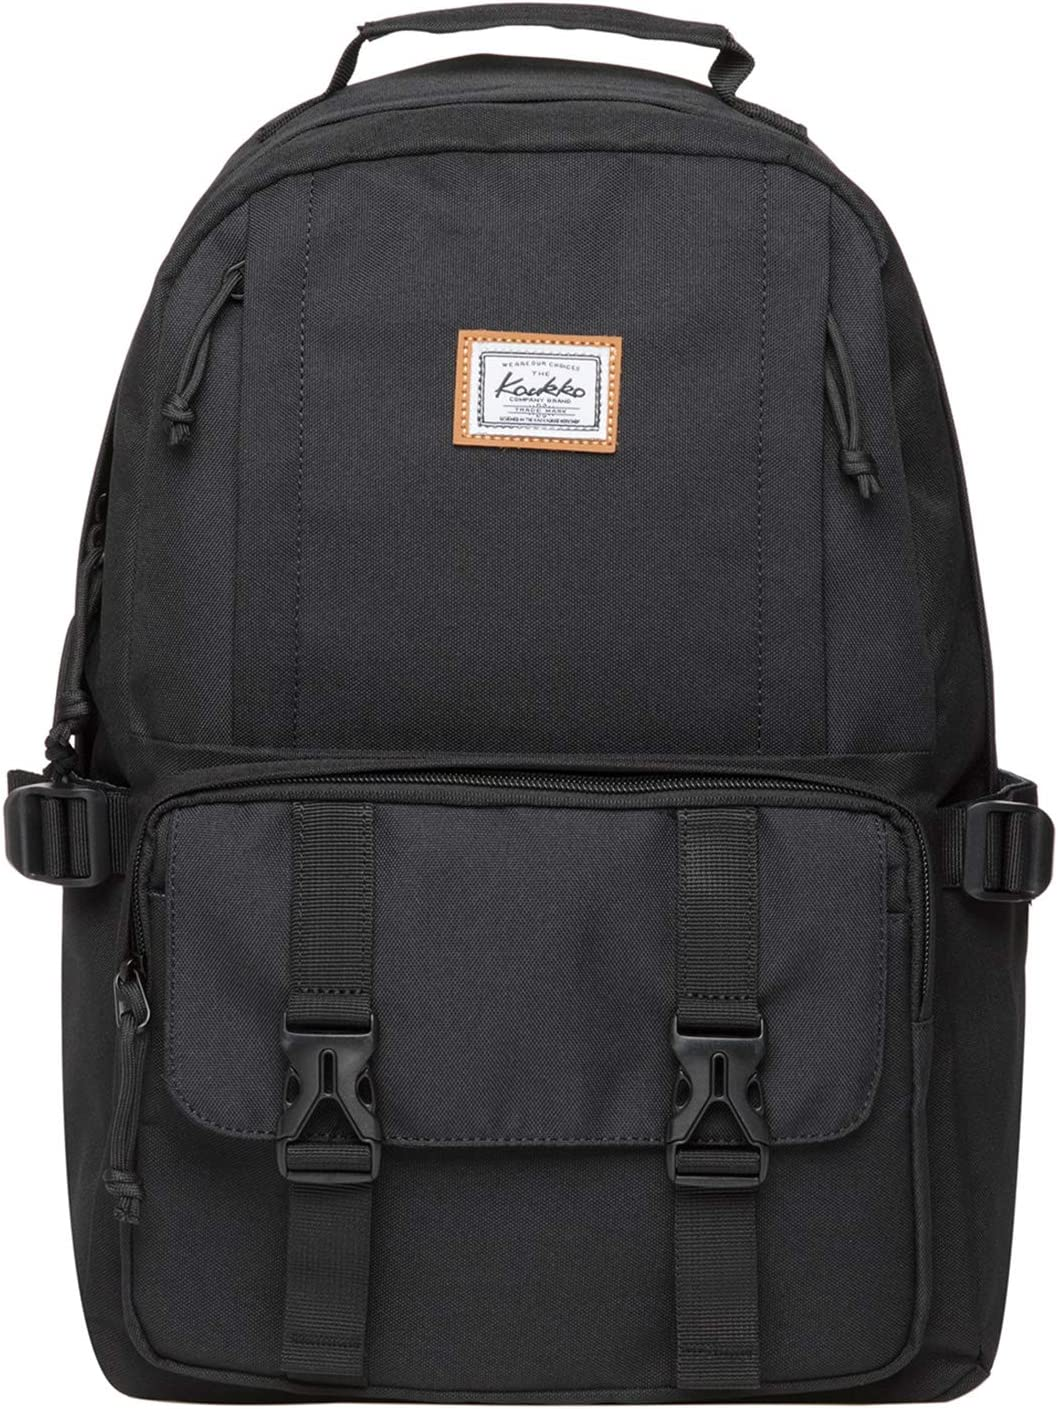 KAUKKO Stylish Laptop Backpack Multipurpose Daypack,18.49L